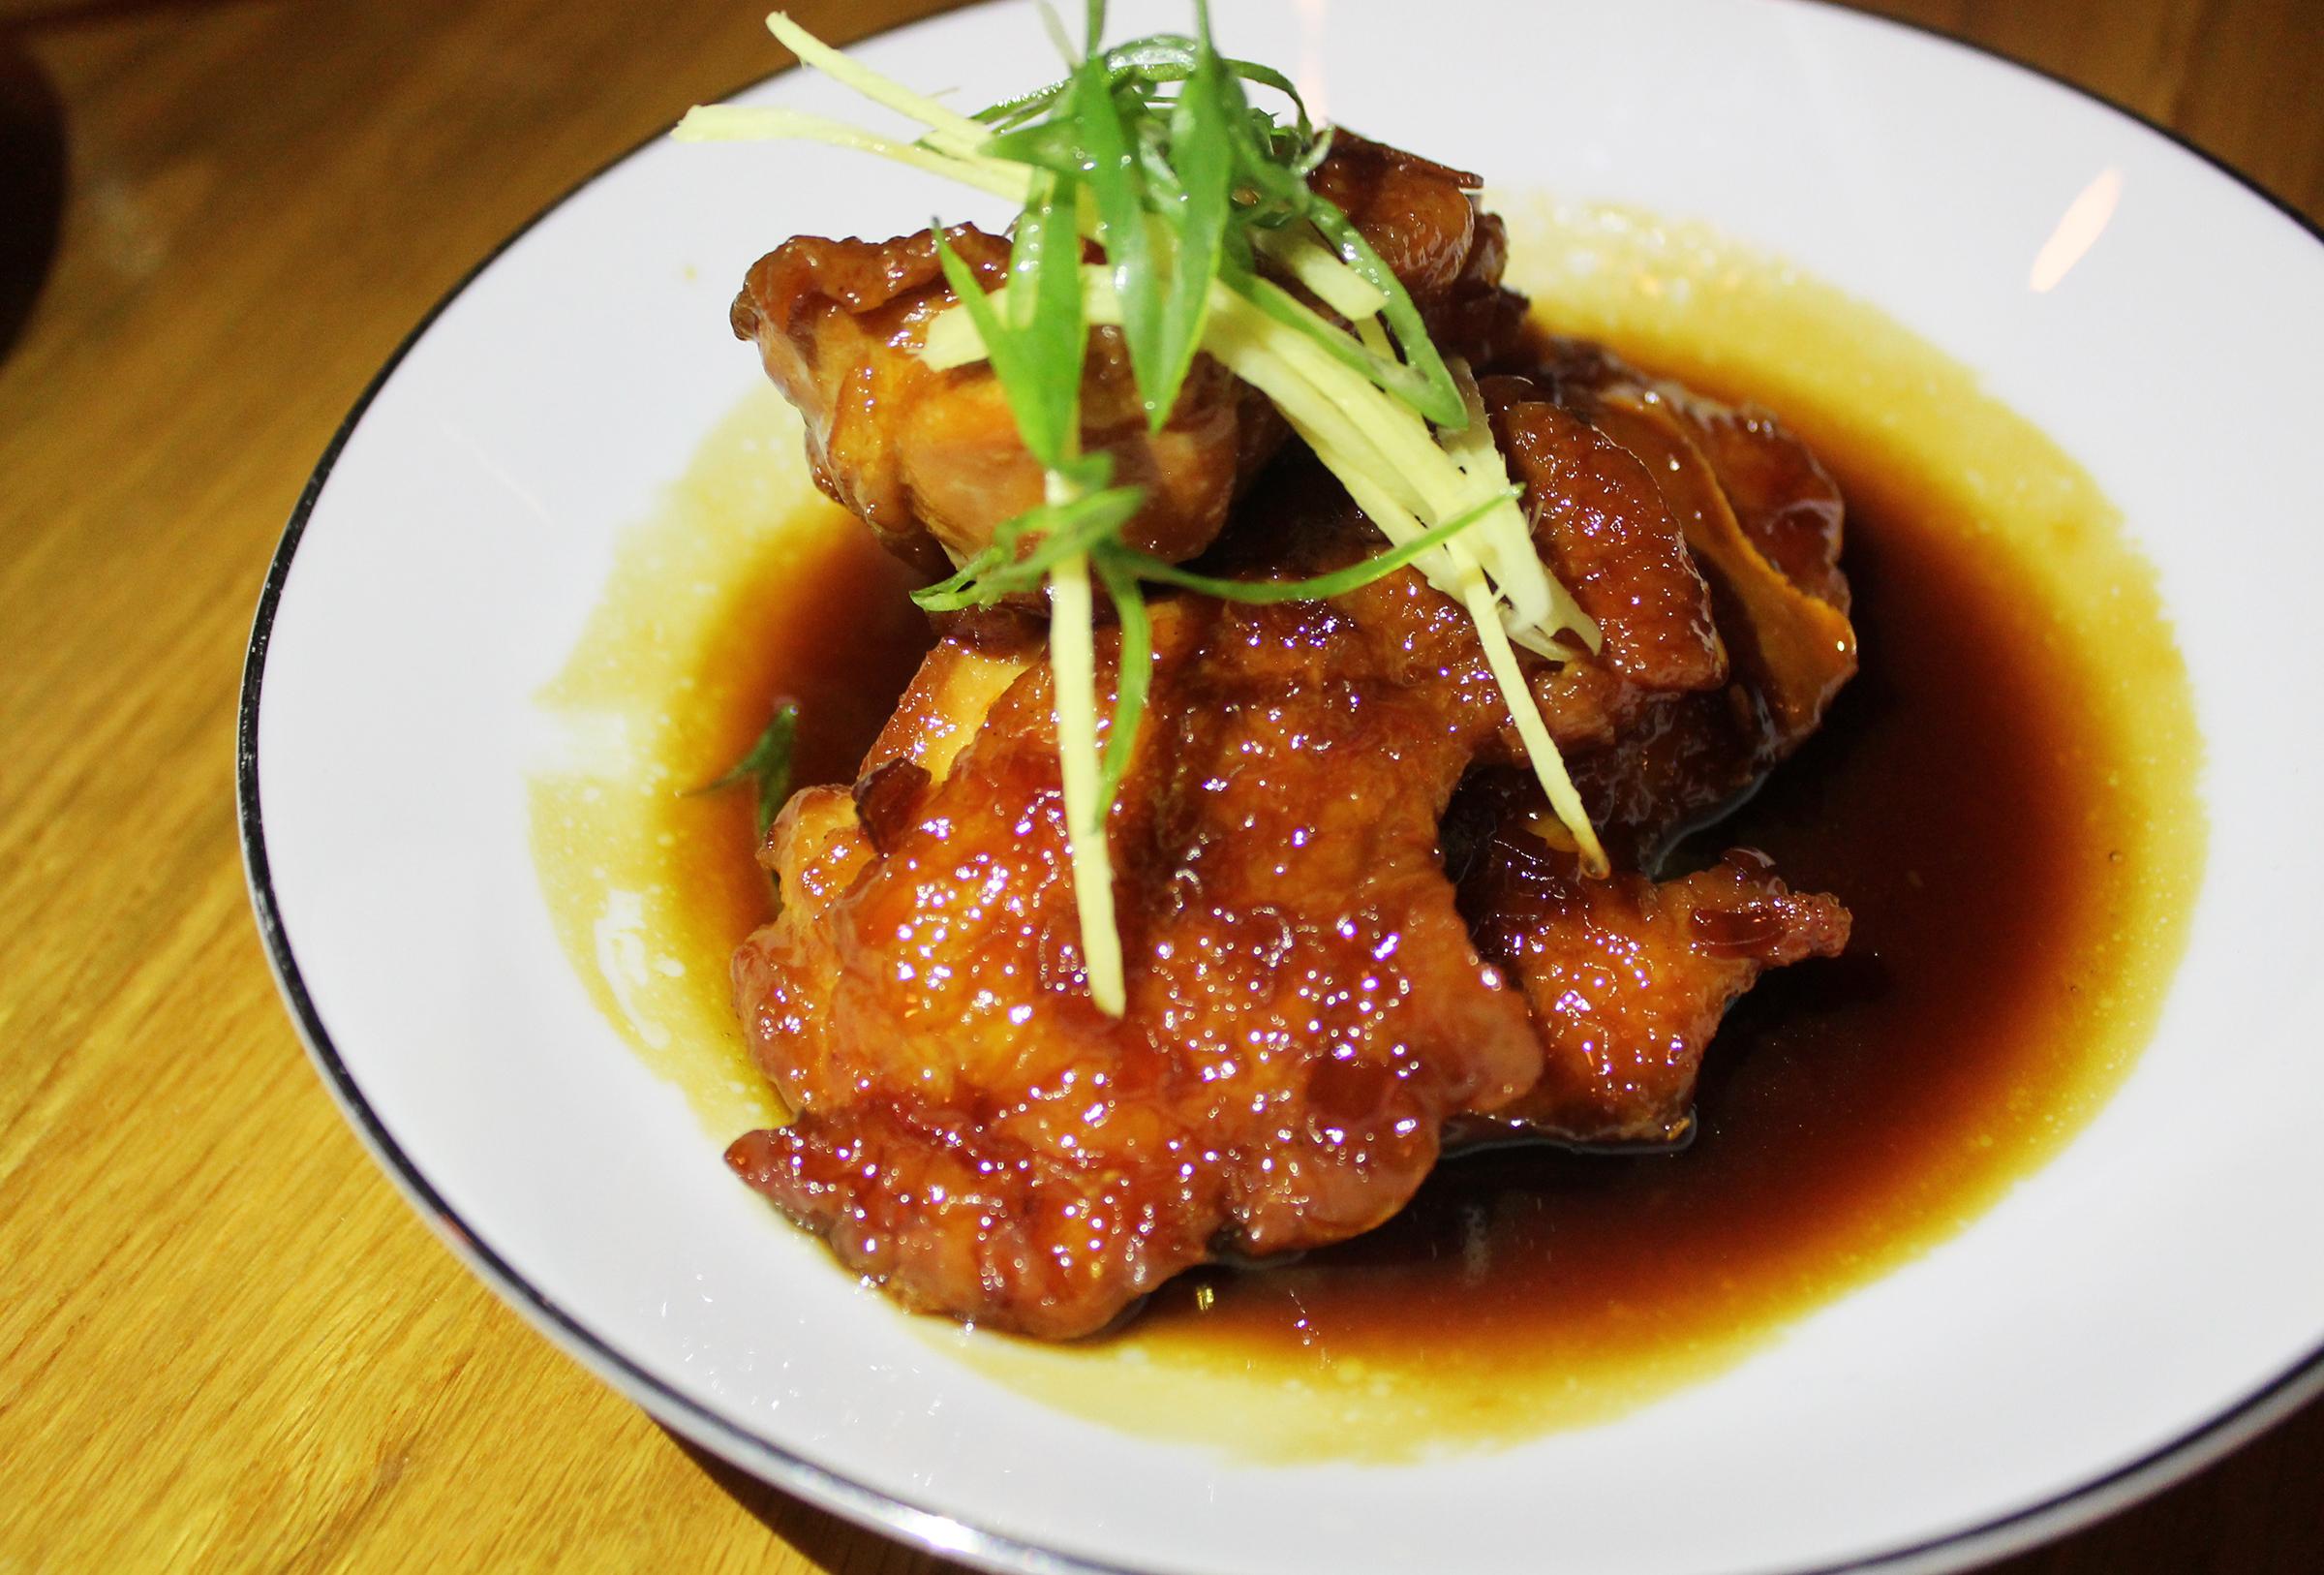 Ginger Caramel Braised Jidori Chicken Thigh